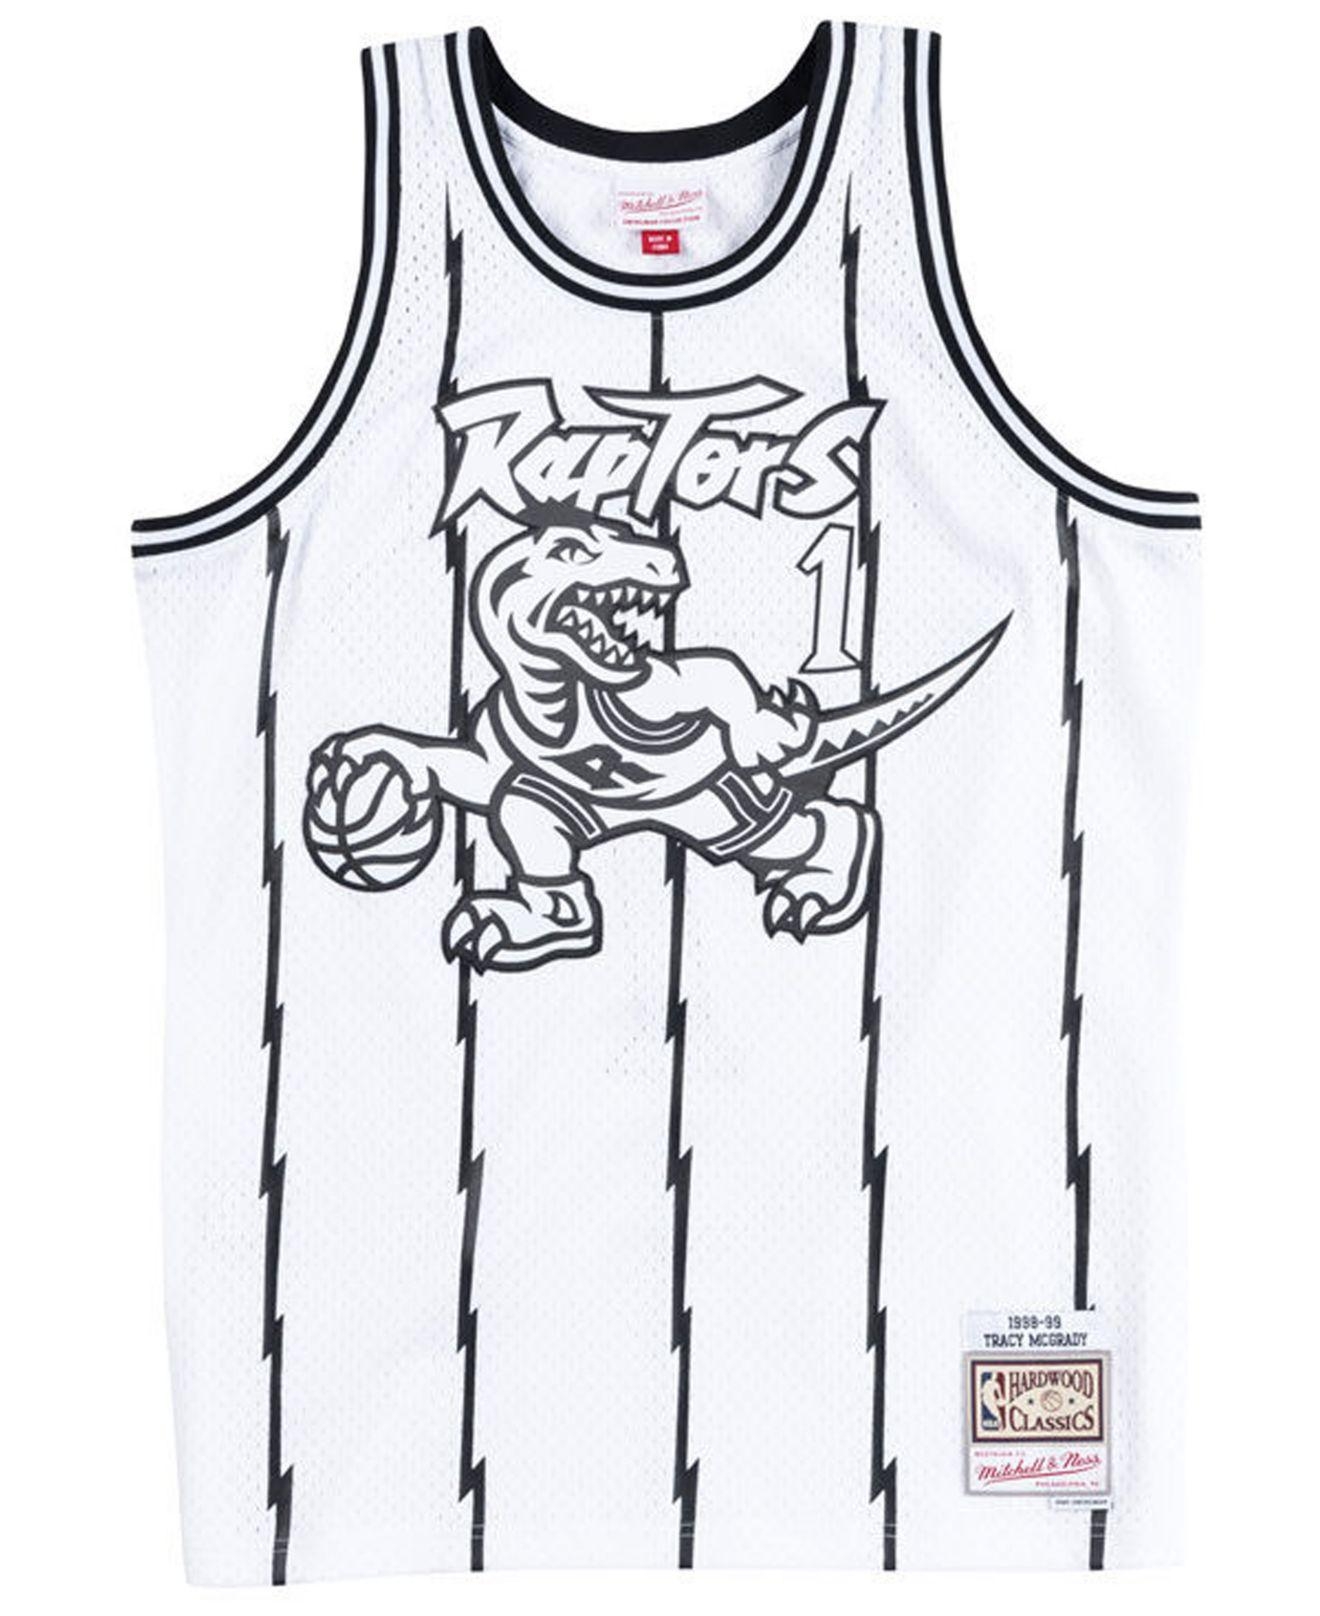 8be1ec8bd38c ... Tracy Mcgrady Toronto Raptors Concord Collection Swingman Jersey for Men  -. View fullscreen